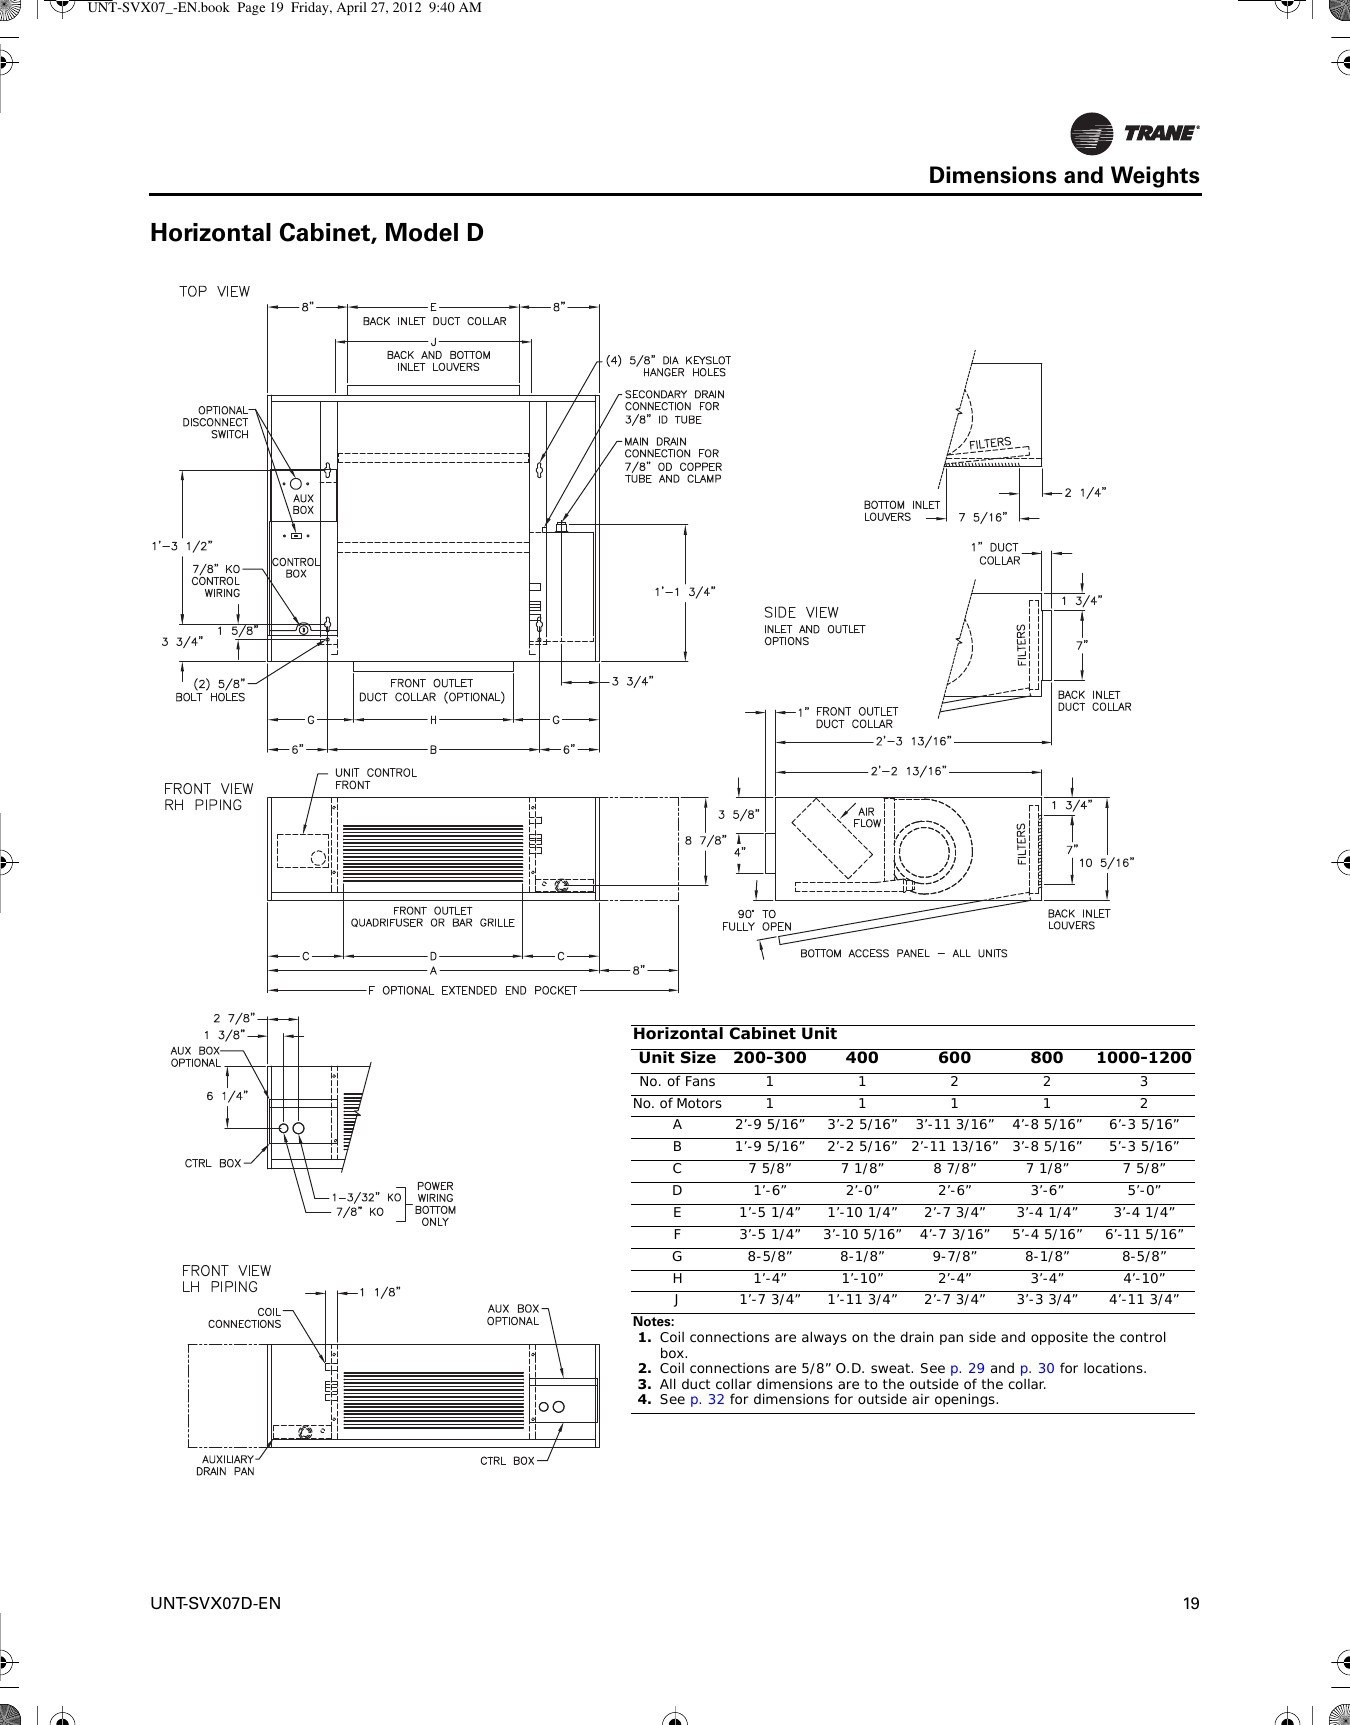 electric heat strip wiring diagram Download-electric heat wiring diagram Download Trane Ac Wiring Diagram Valid Electrical Outlet Wiring Diagram Elegant DOWNLOAD Wiring Diagram 5-l